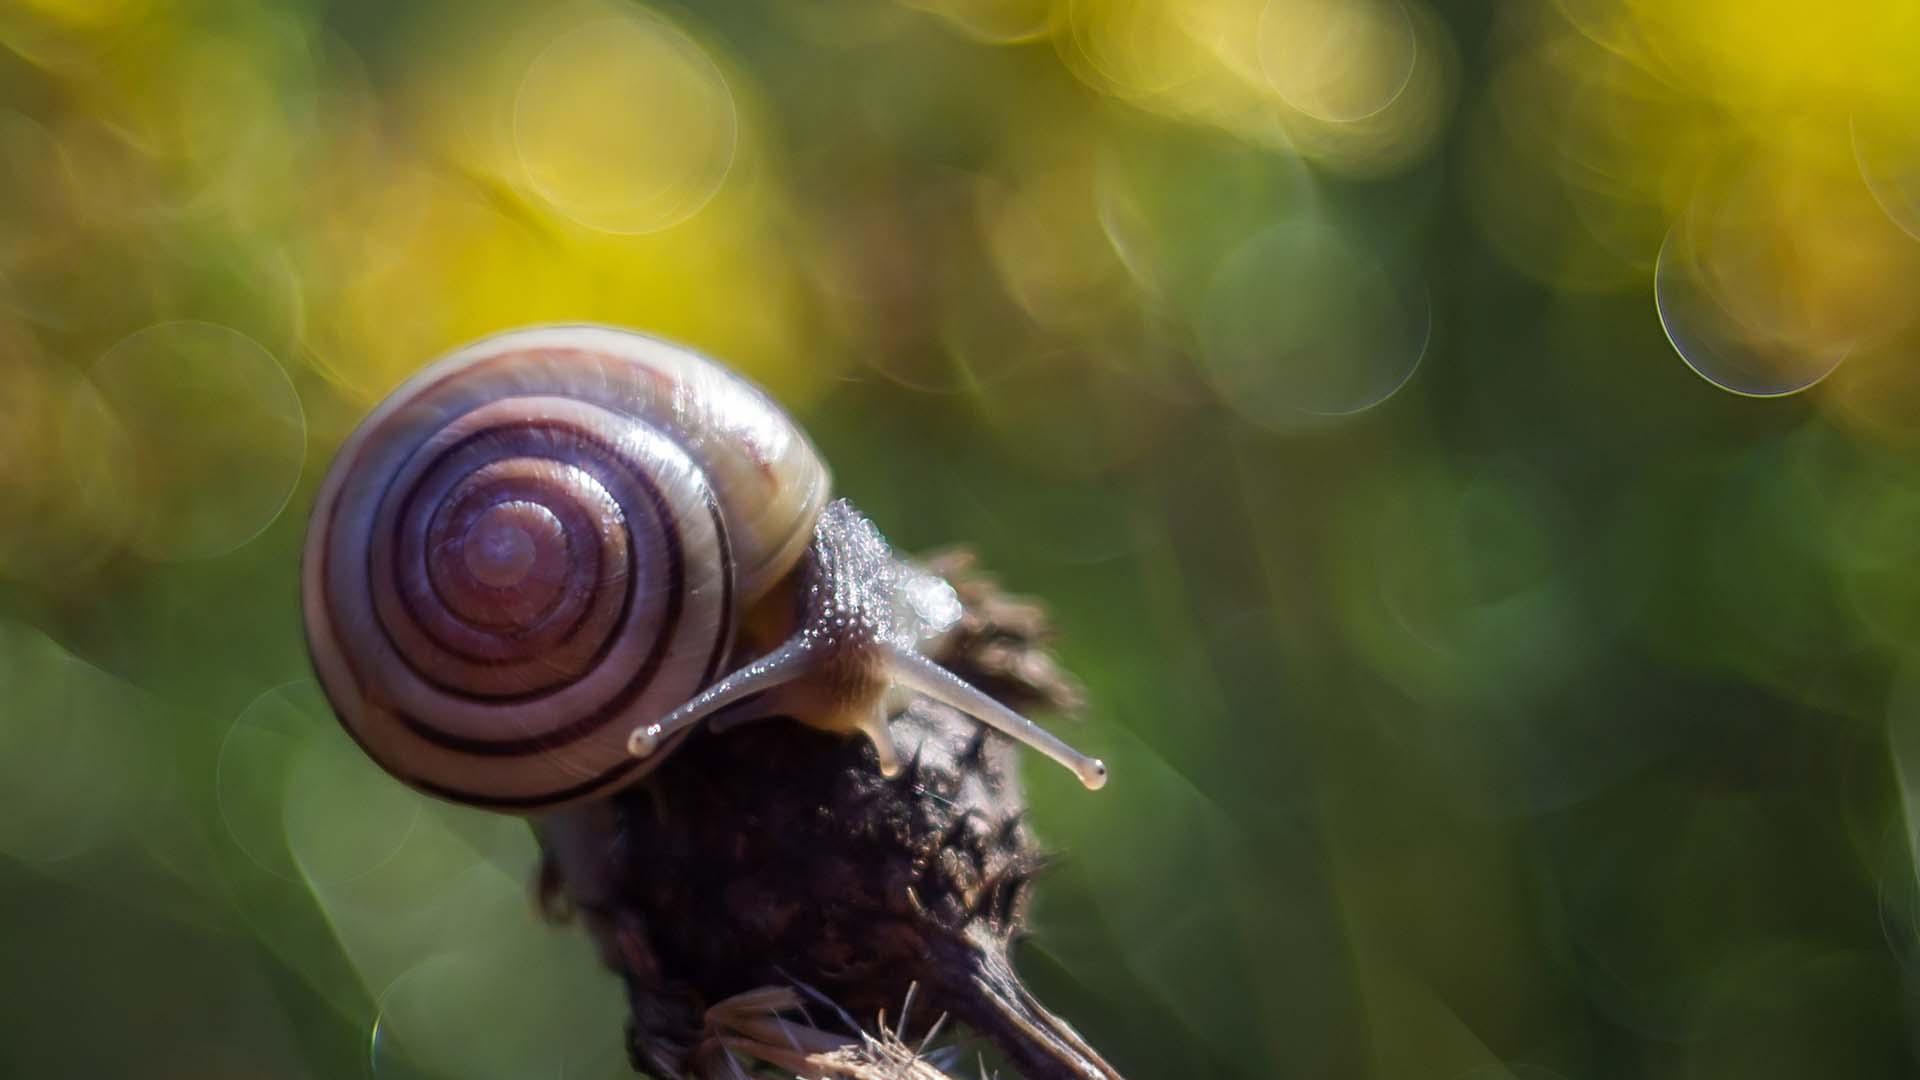 snail macro photography wallpaper 51242